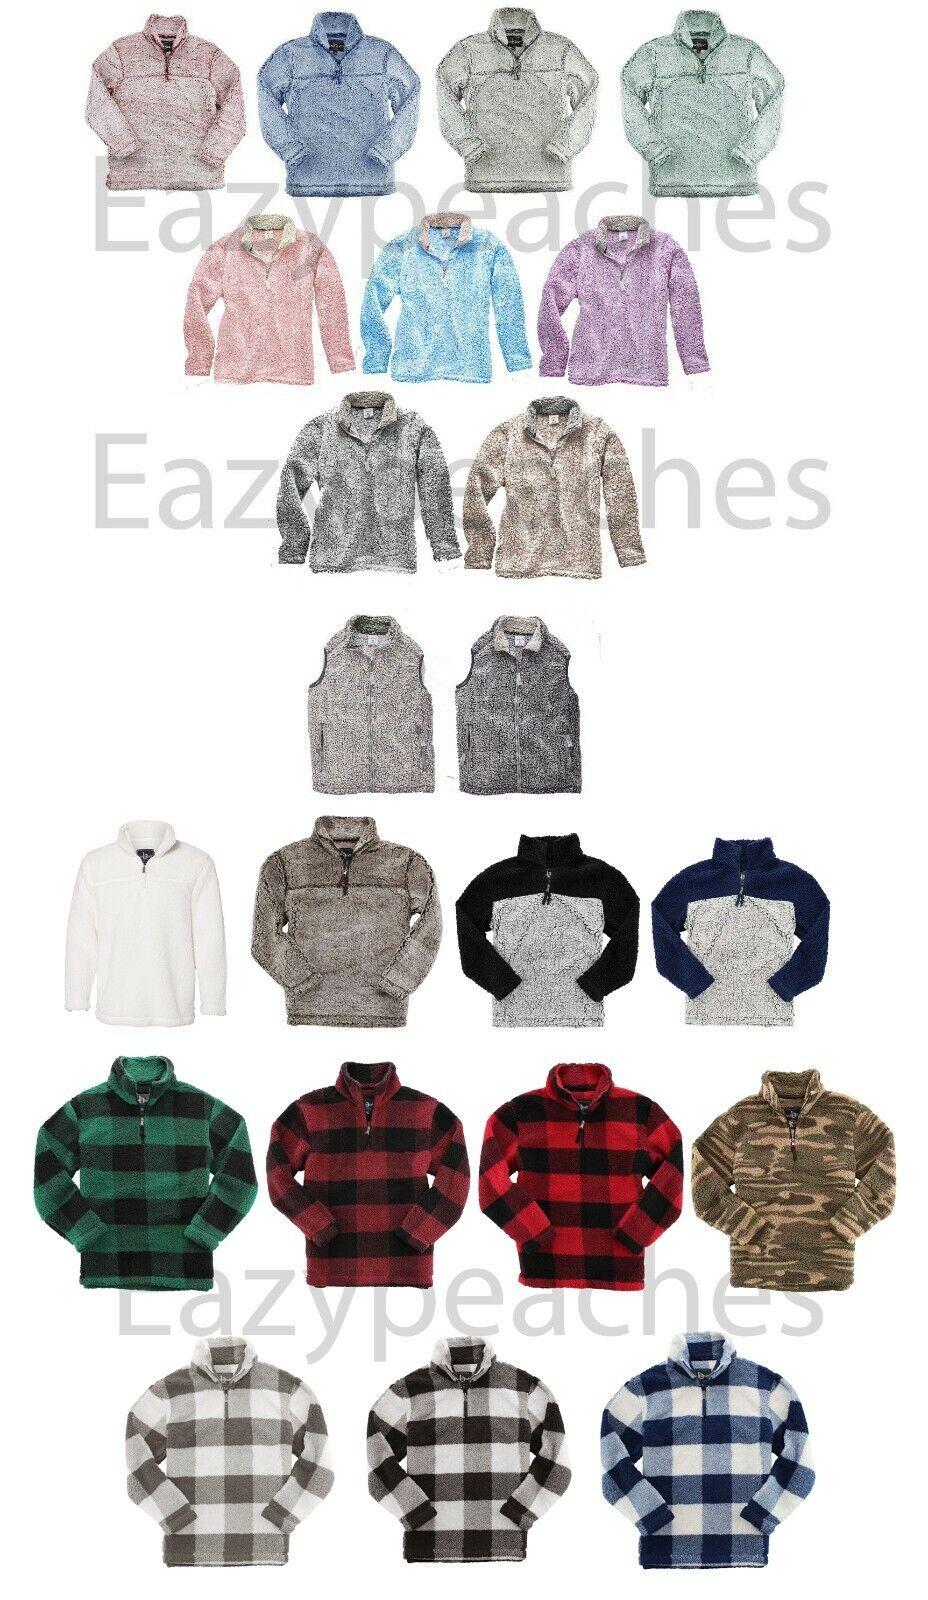 Sherpa Fleece, Peaches, Sizes XS-2XL, Women's, Men's, Quarte